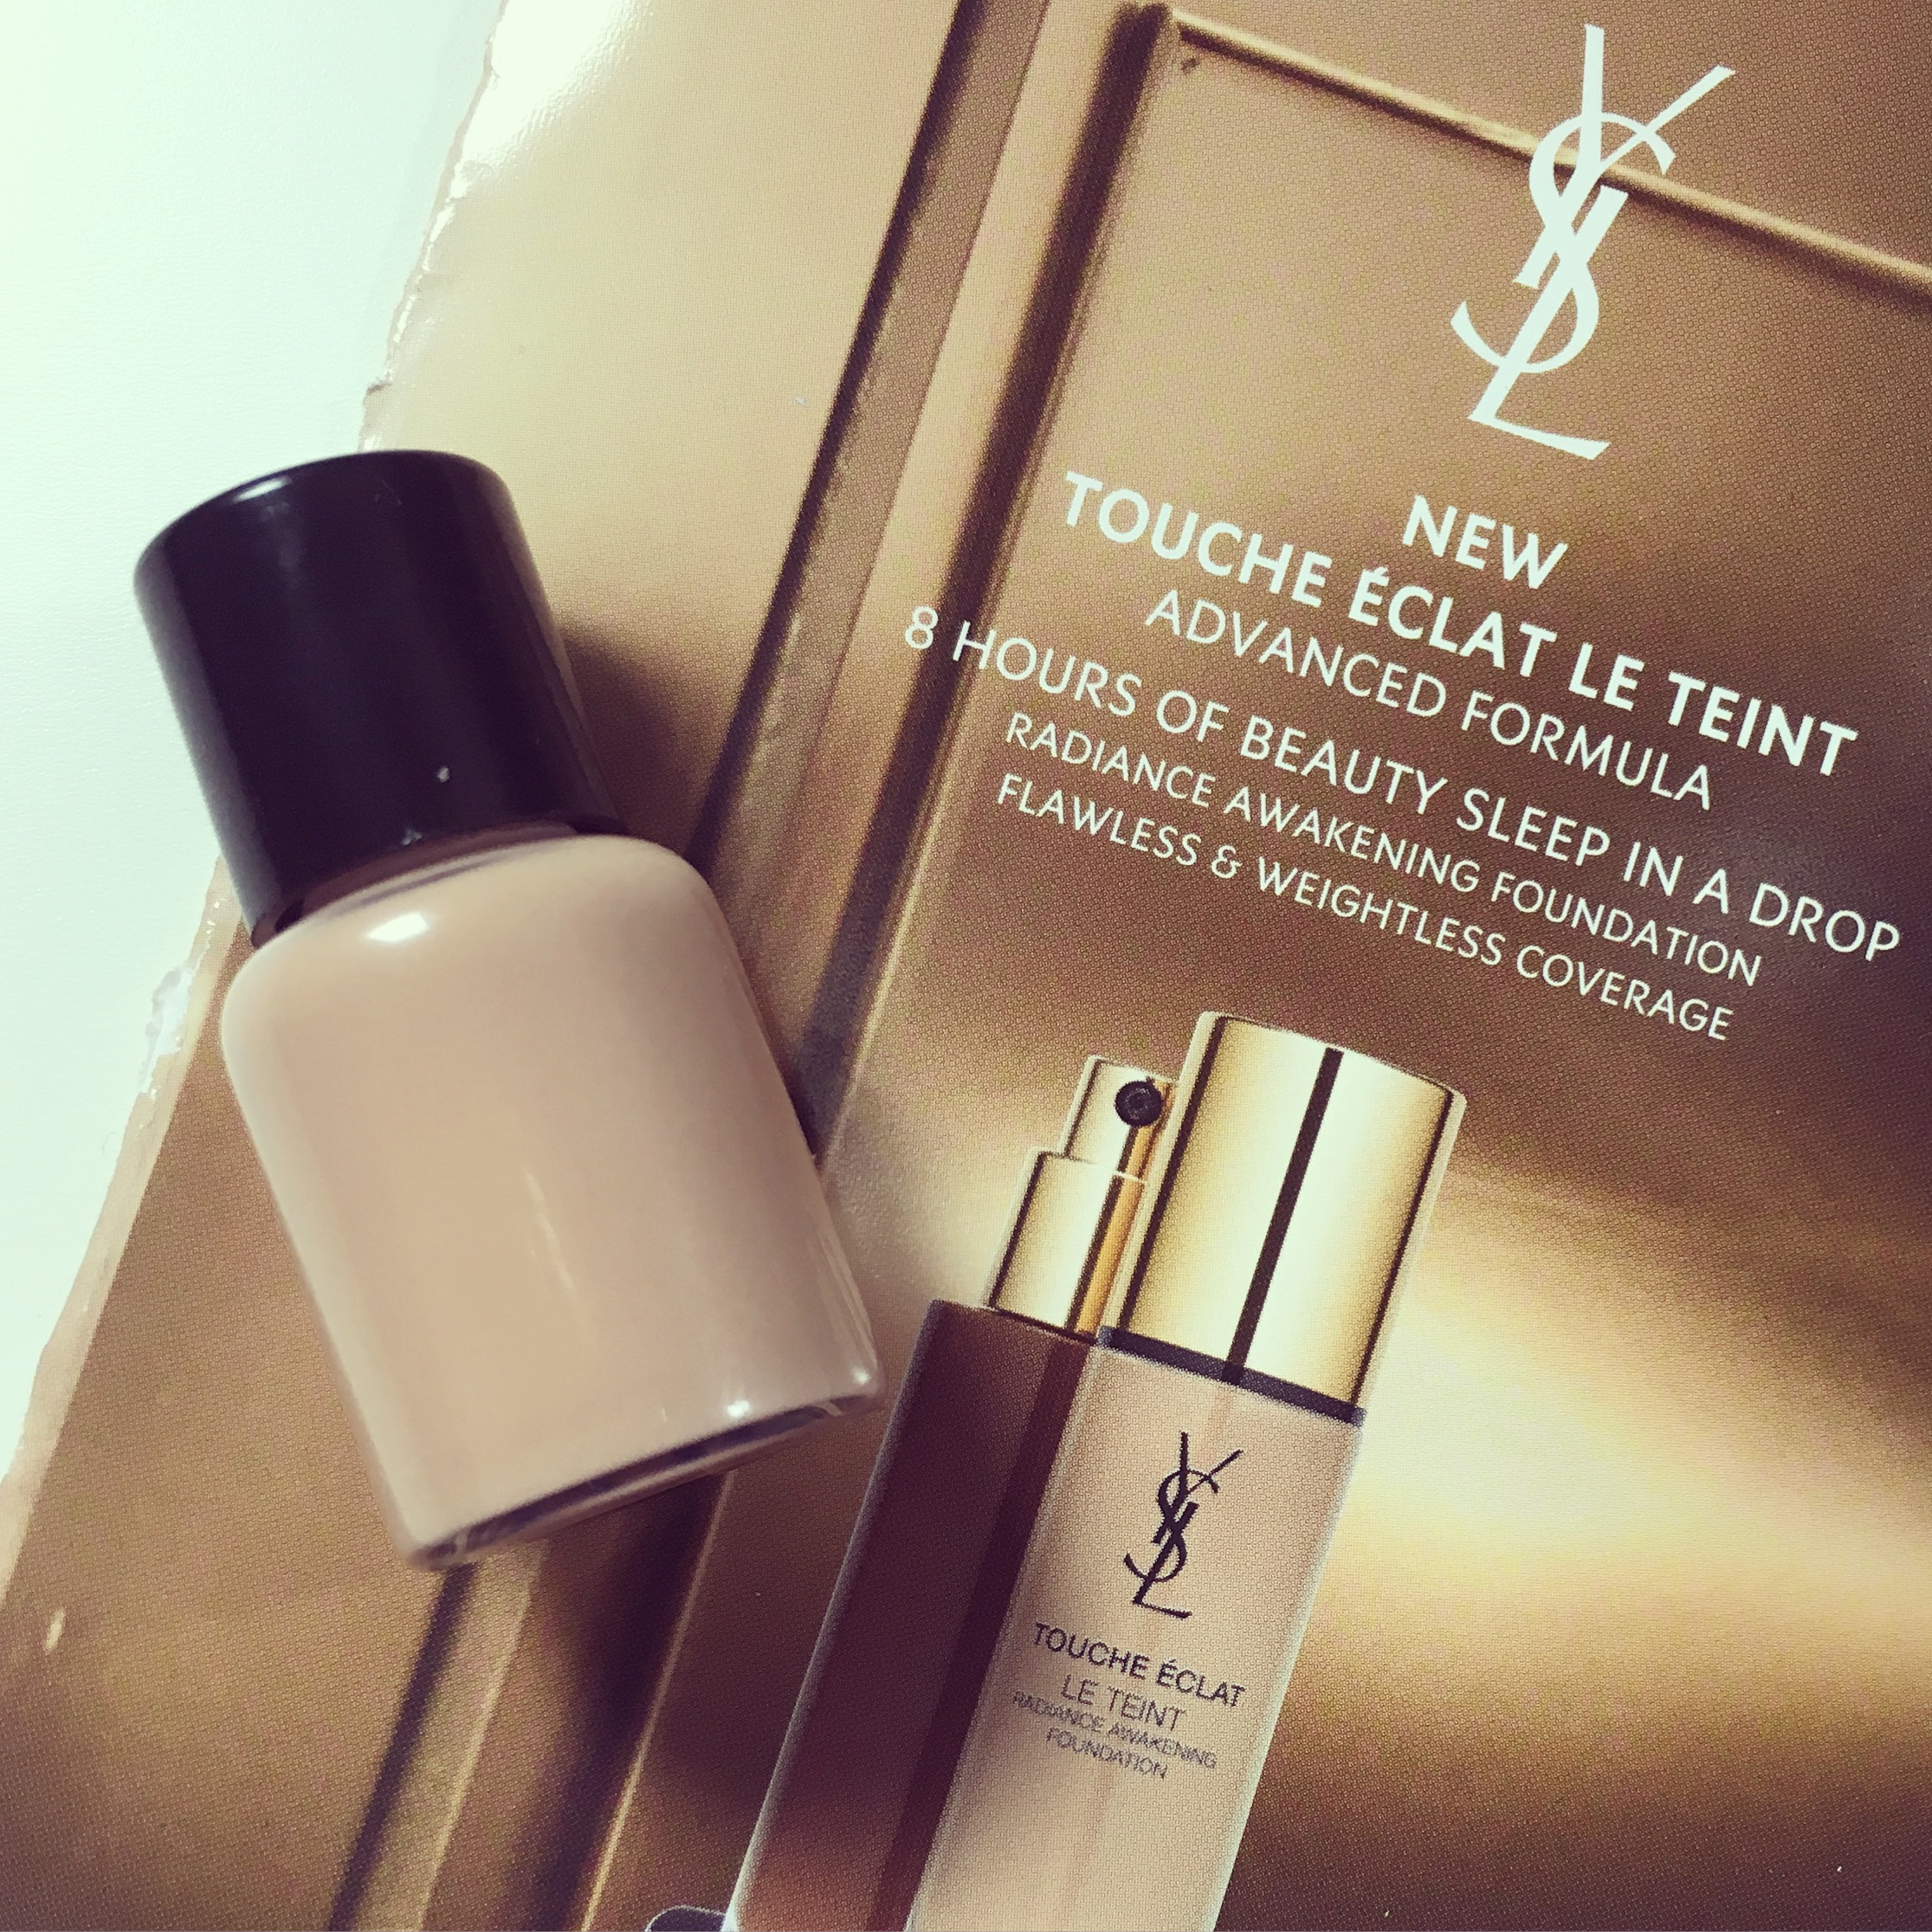 Review Ysl Touche Eclat Foundation Reformulation Edition Lipstick Latitude